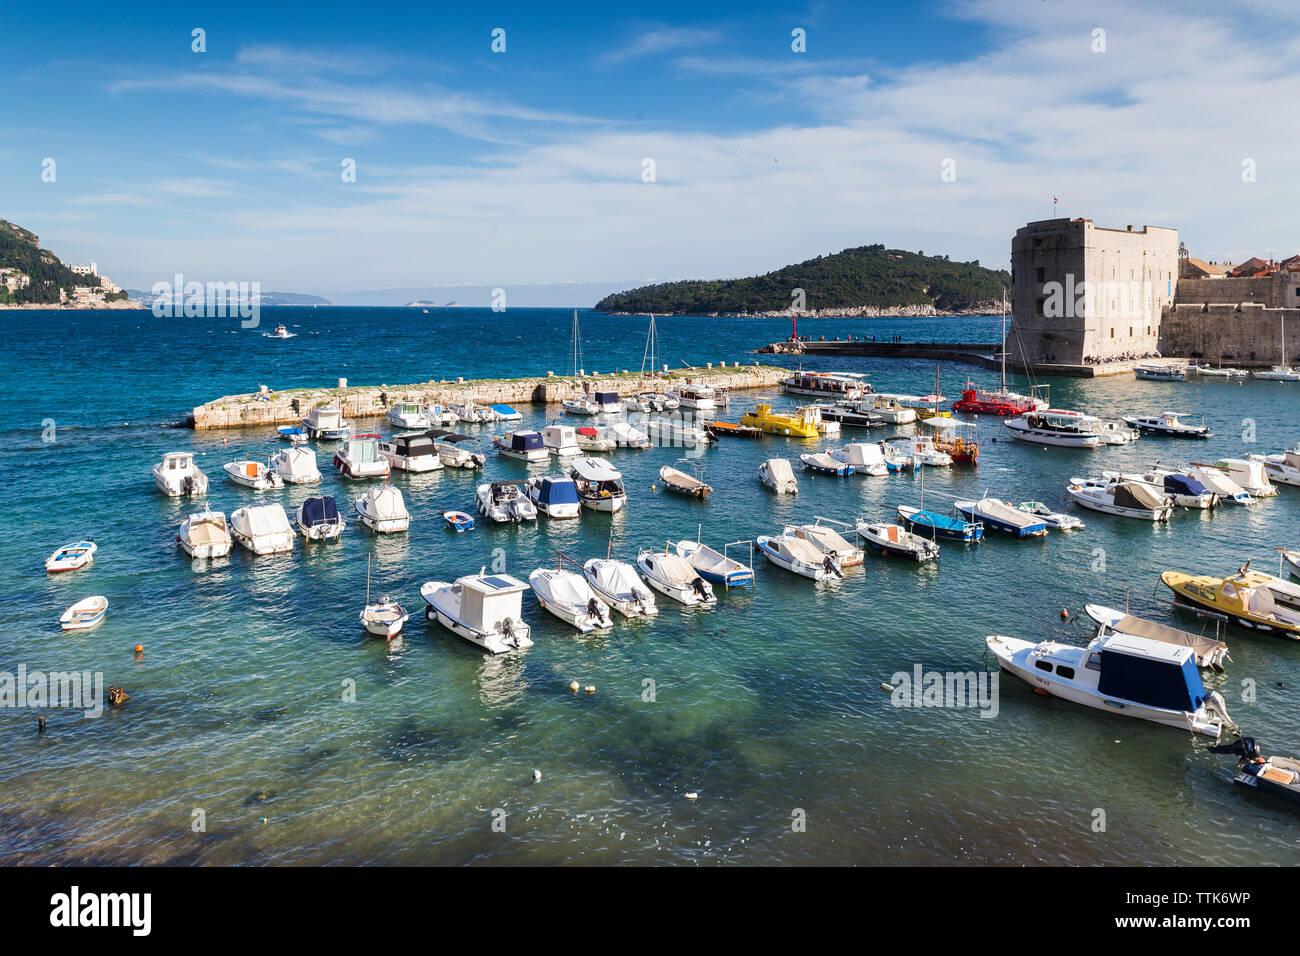 03 May 2019, Dubrovnik, Croatia. Old city port. - Stock Image